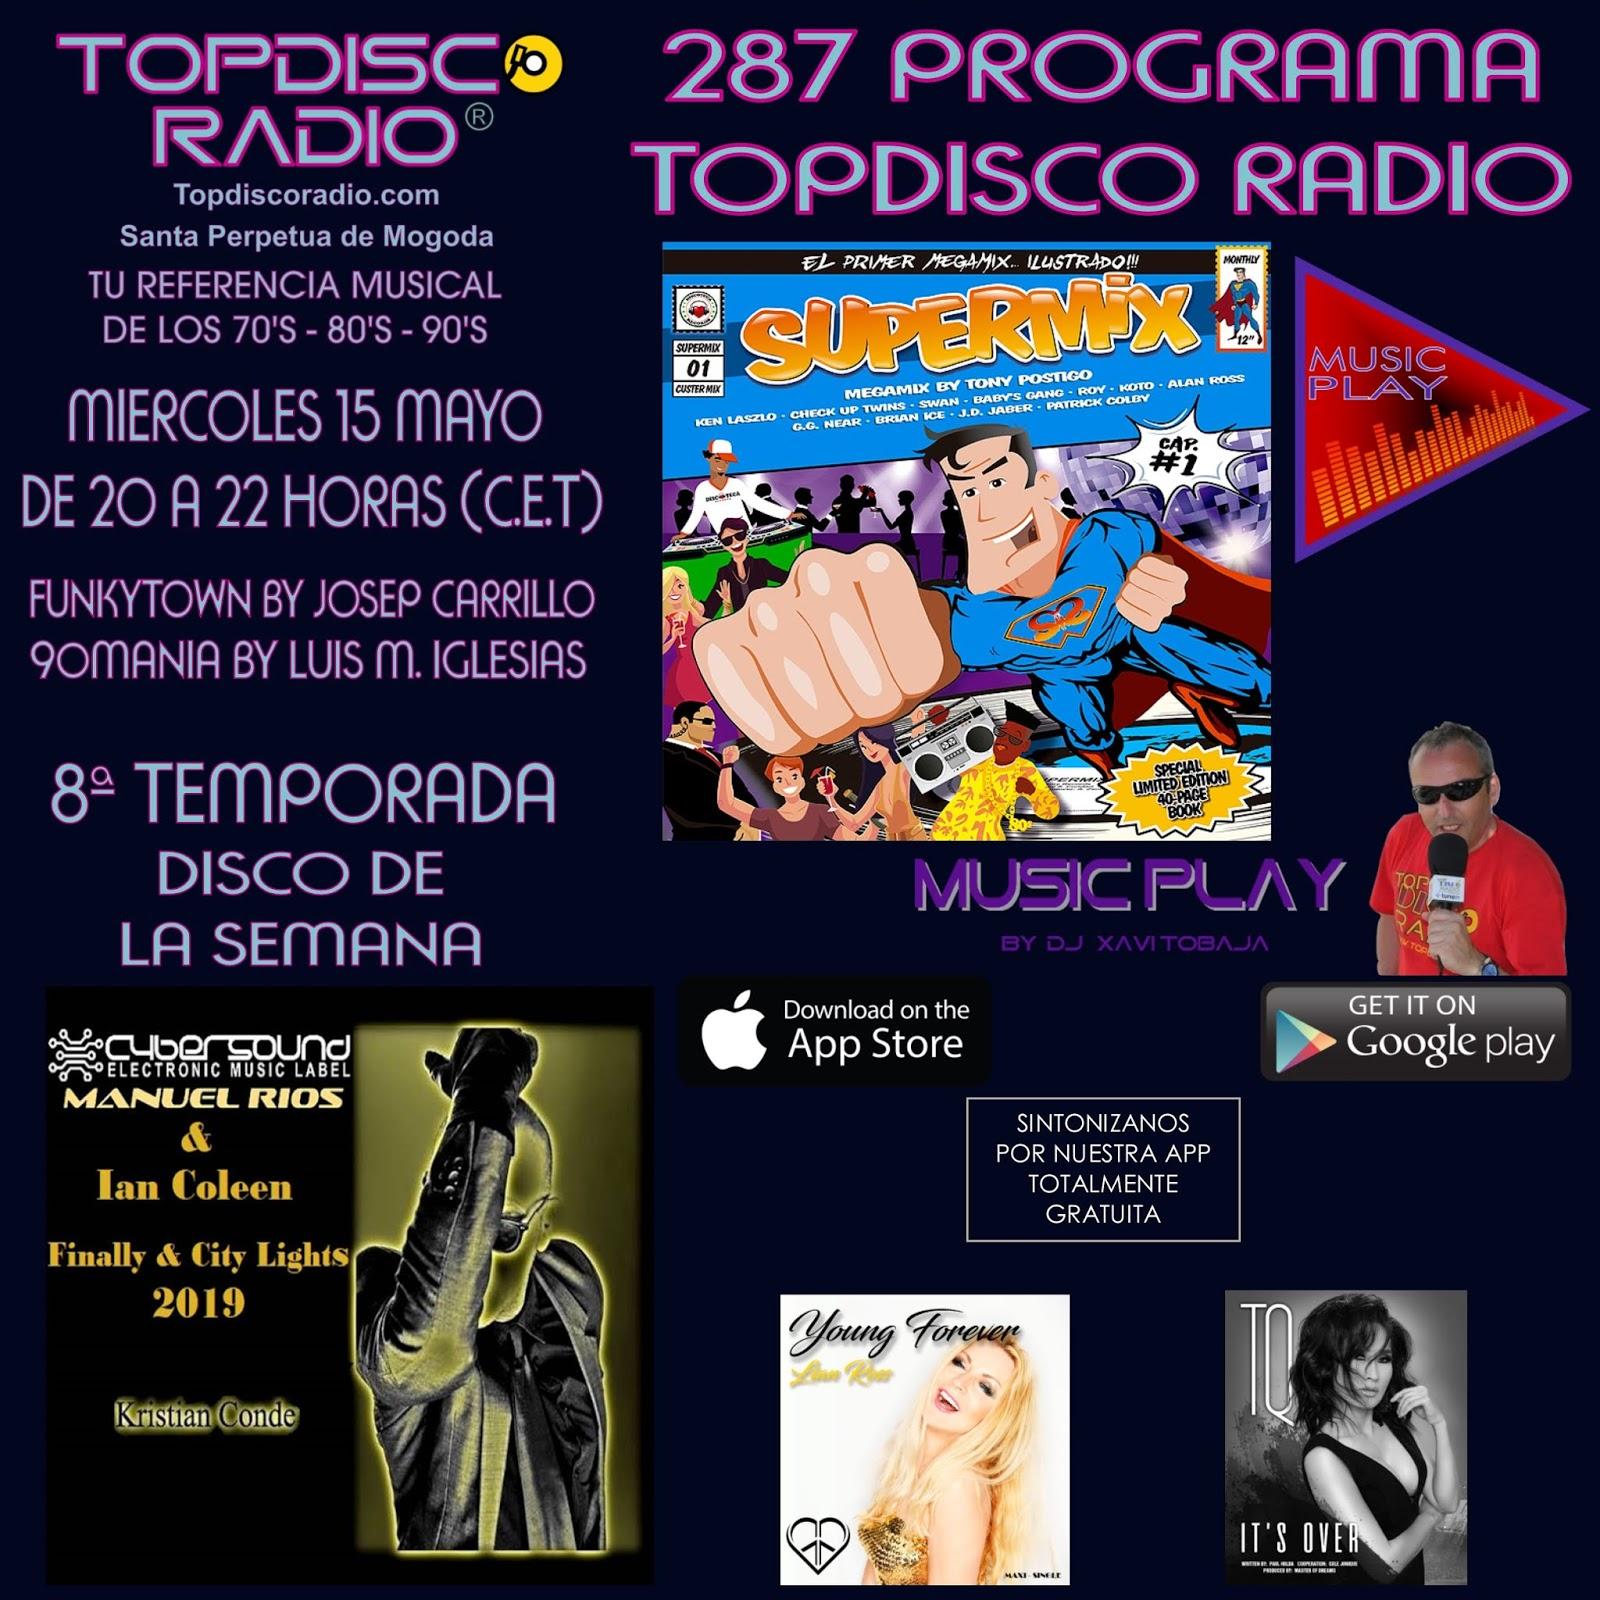 287 Programa Topdisco Radio